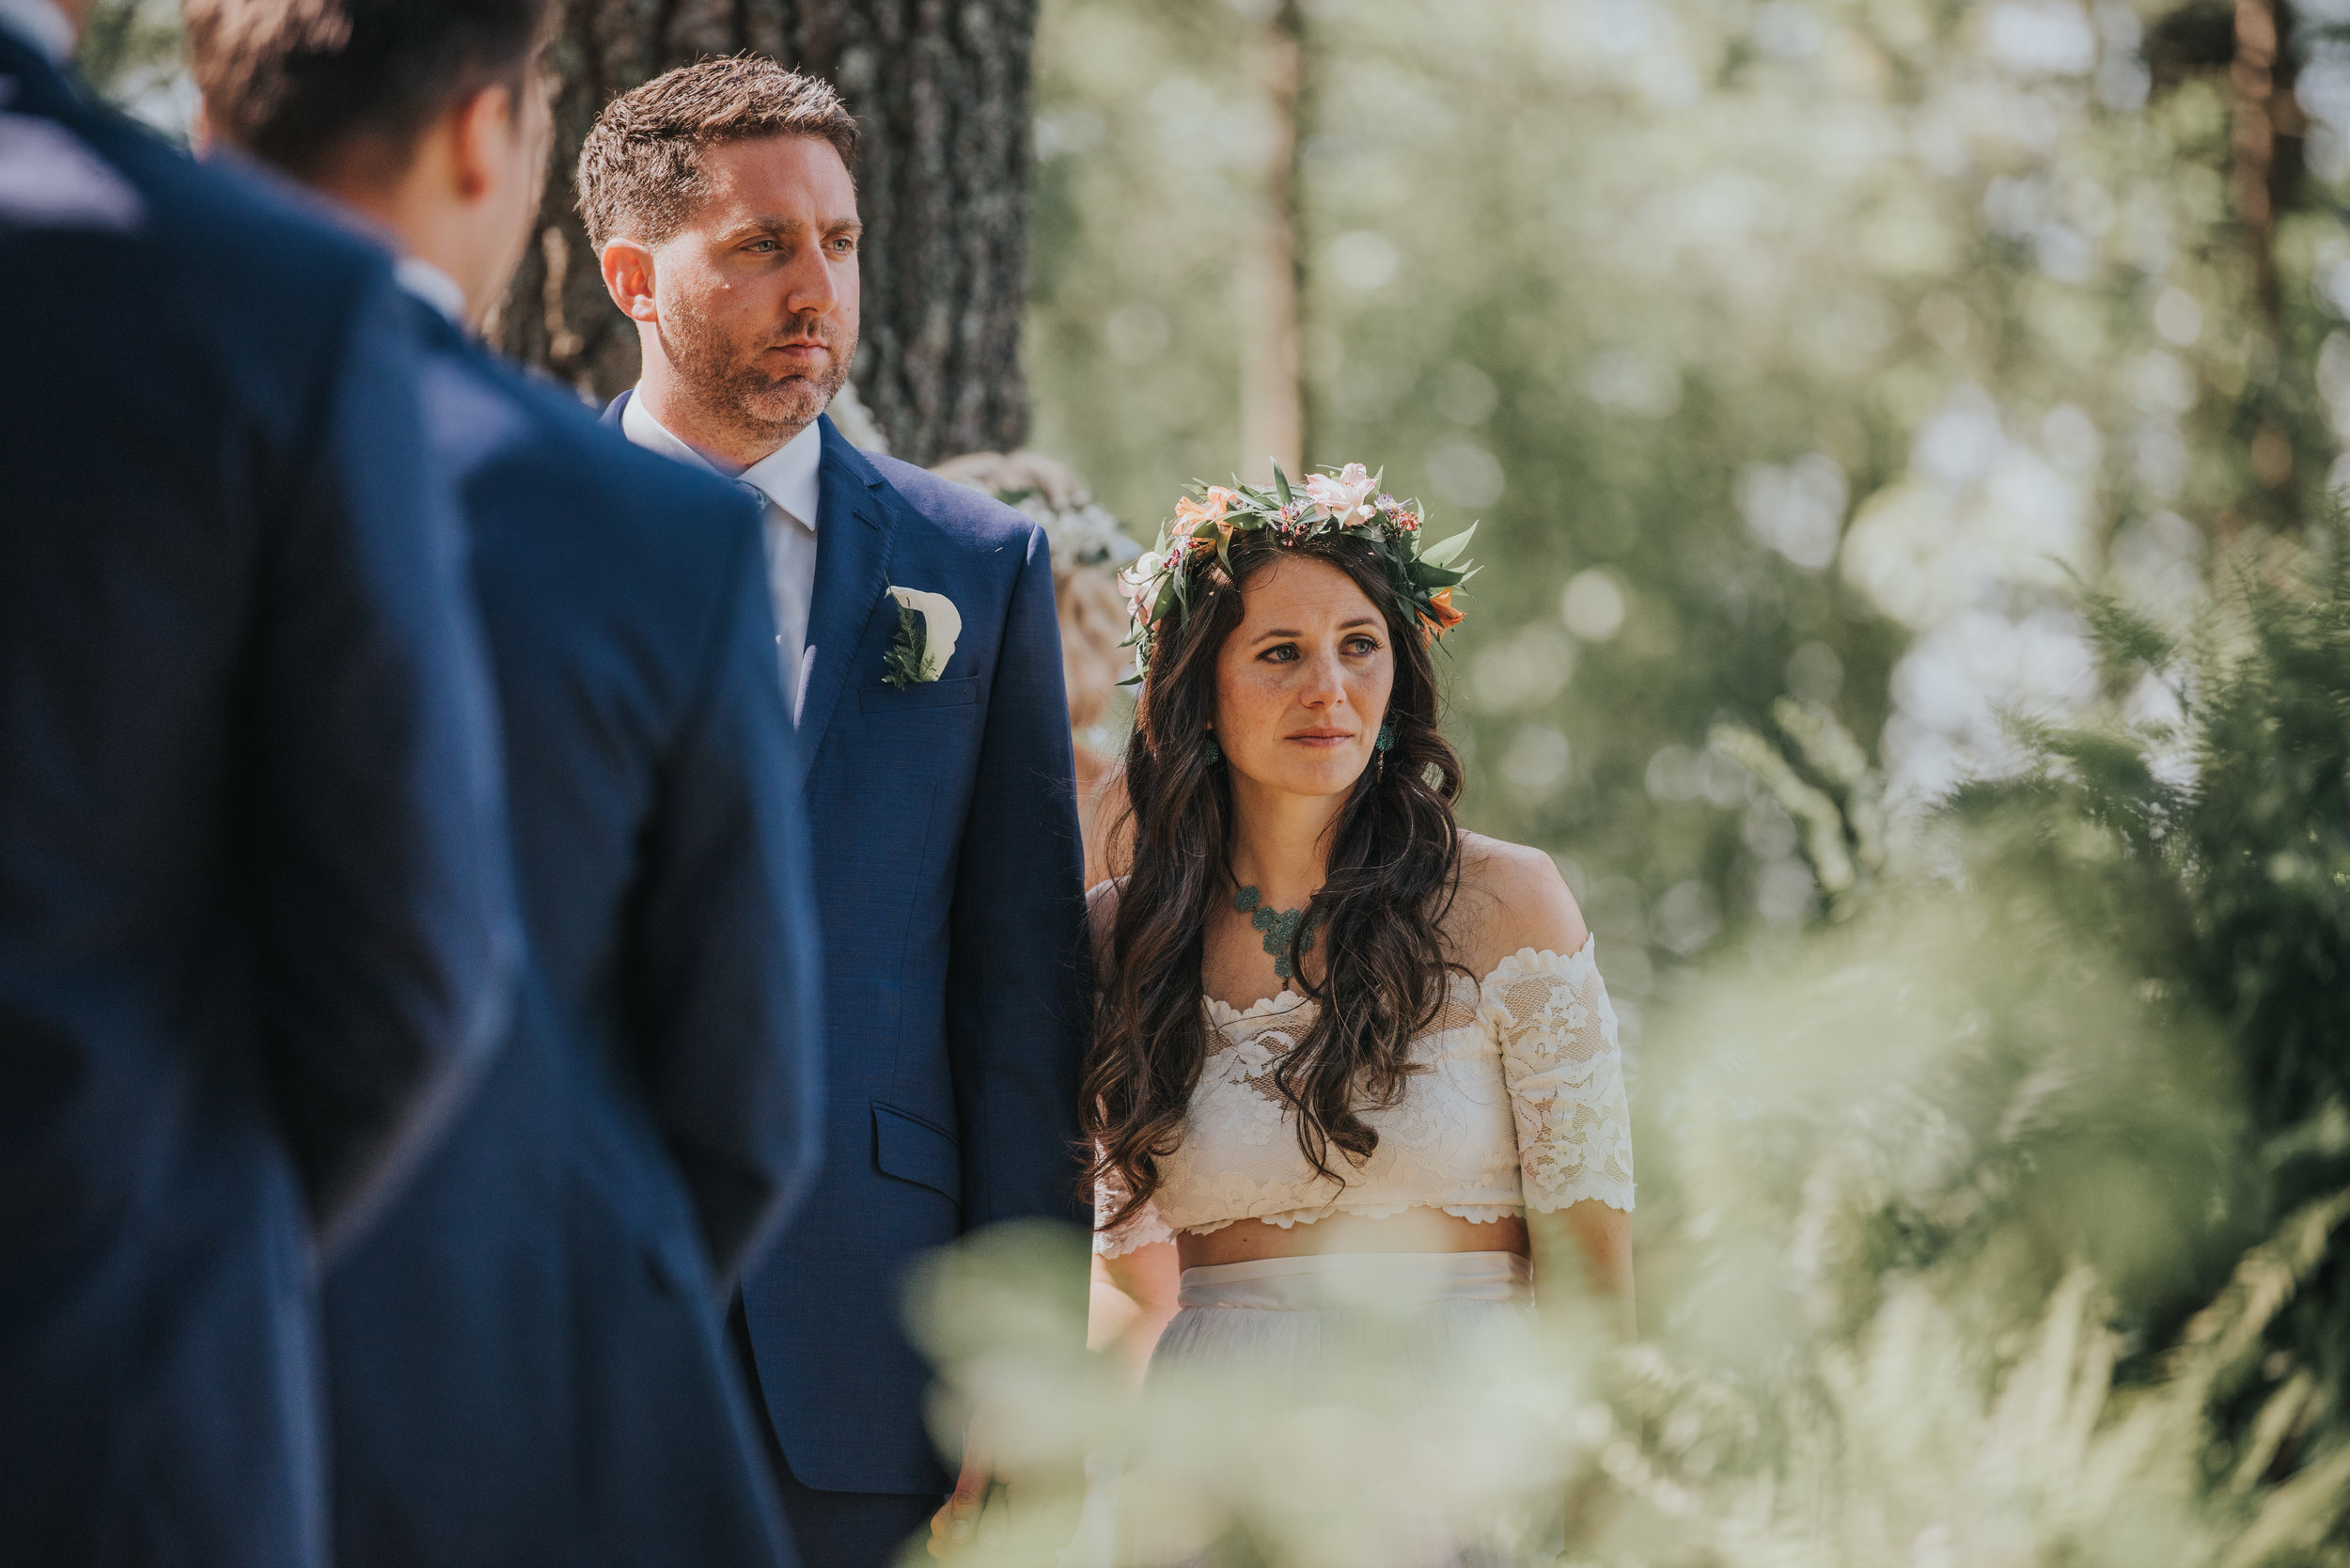 bride-and-groom-during-wedding-ceremony-toronto-bohemian-boho-outdoor-summer-wedding-documentary-wedding-photography-by-willow-birch-photo.jpg